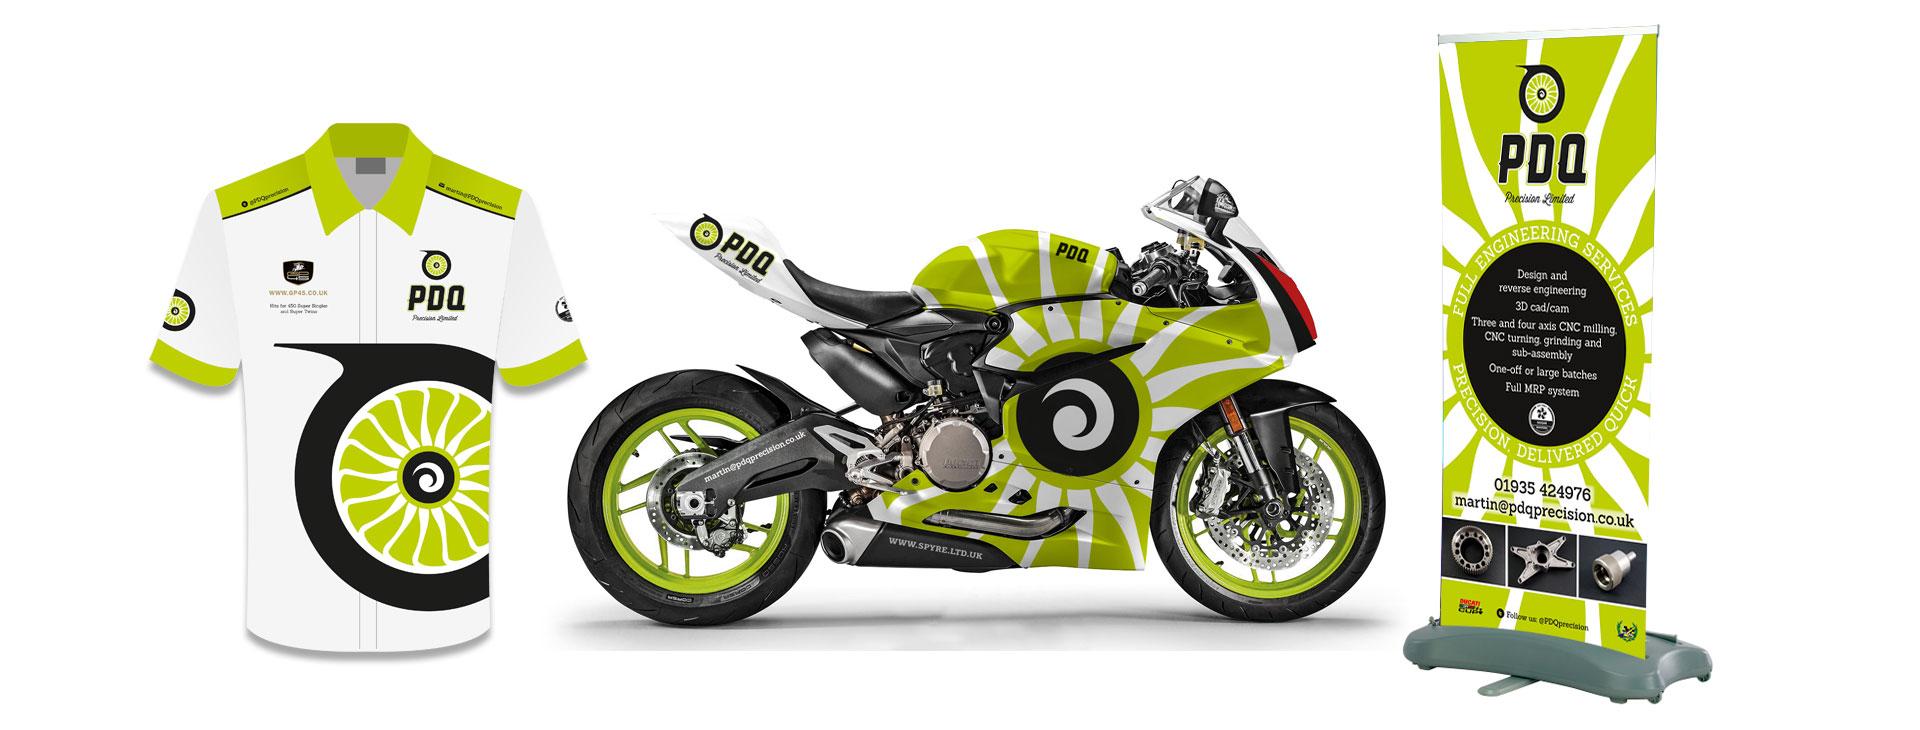 Motorcycle race graphics